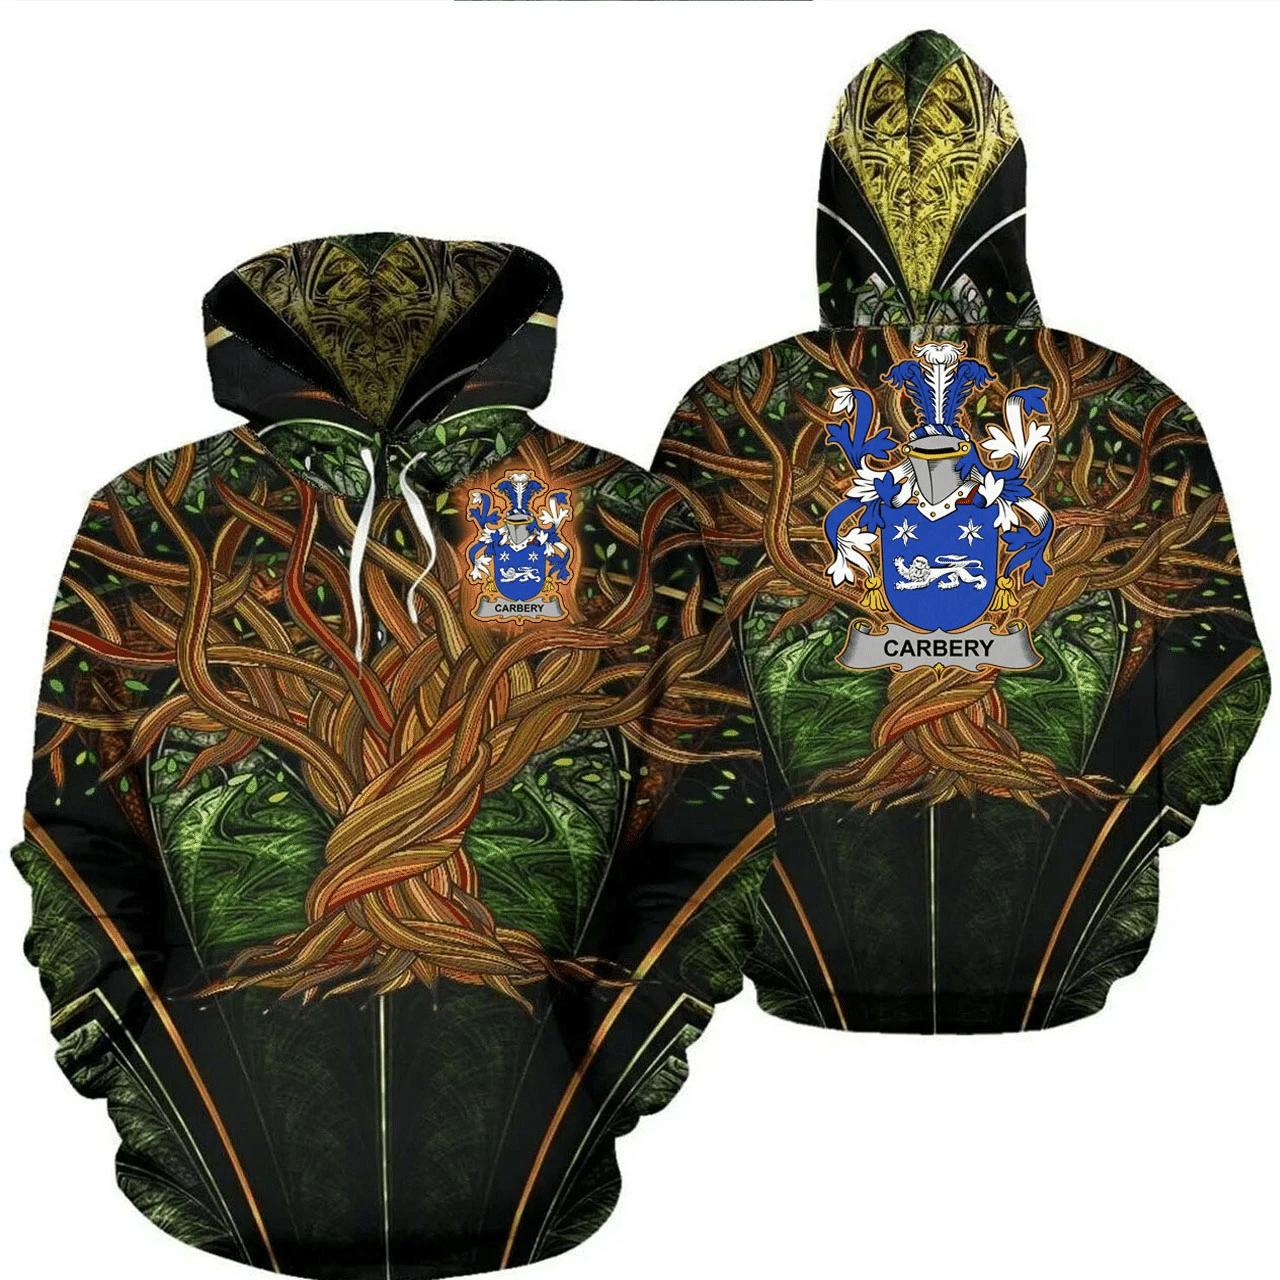 1stIreland Ireland Hoodie - Carbery Irish Family Crest Hoodie - Tree Of Life A7